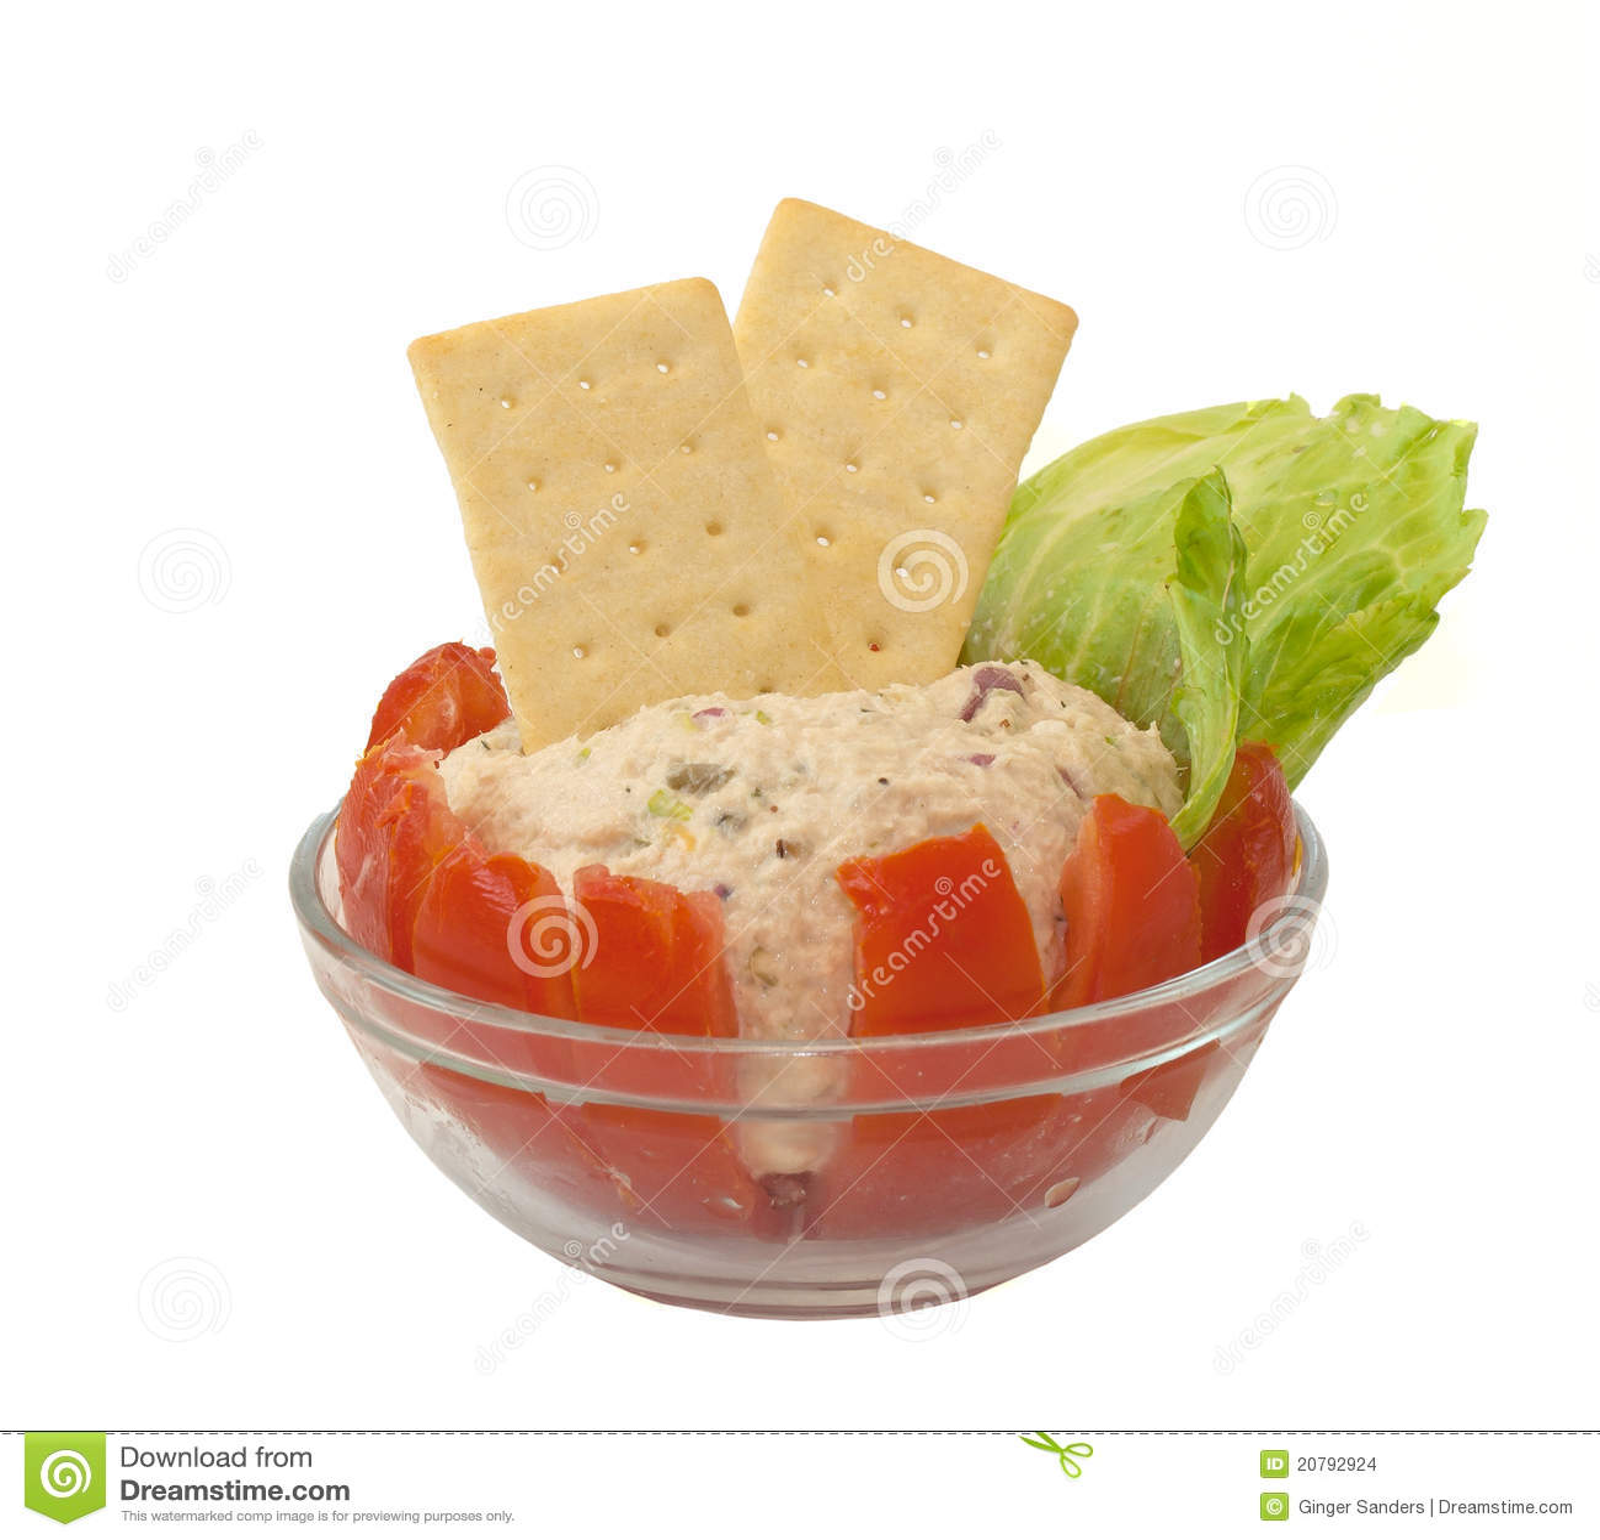 Homemade Tuna Salad Stuffed Tomato